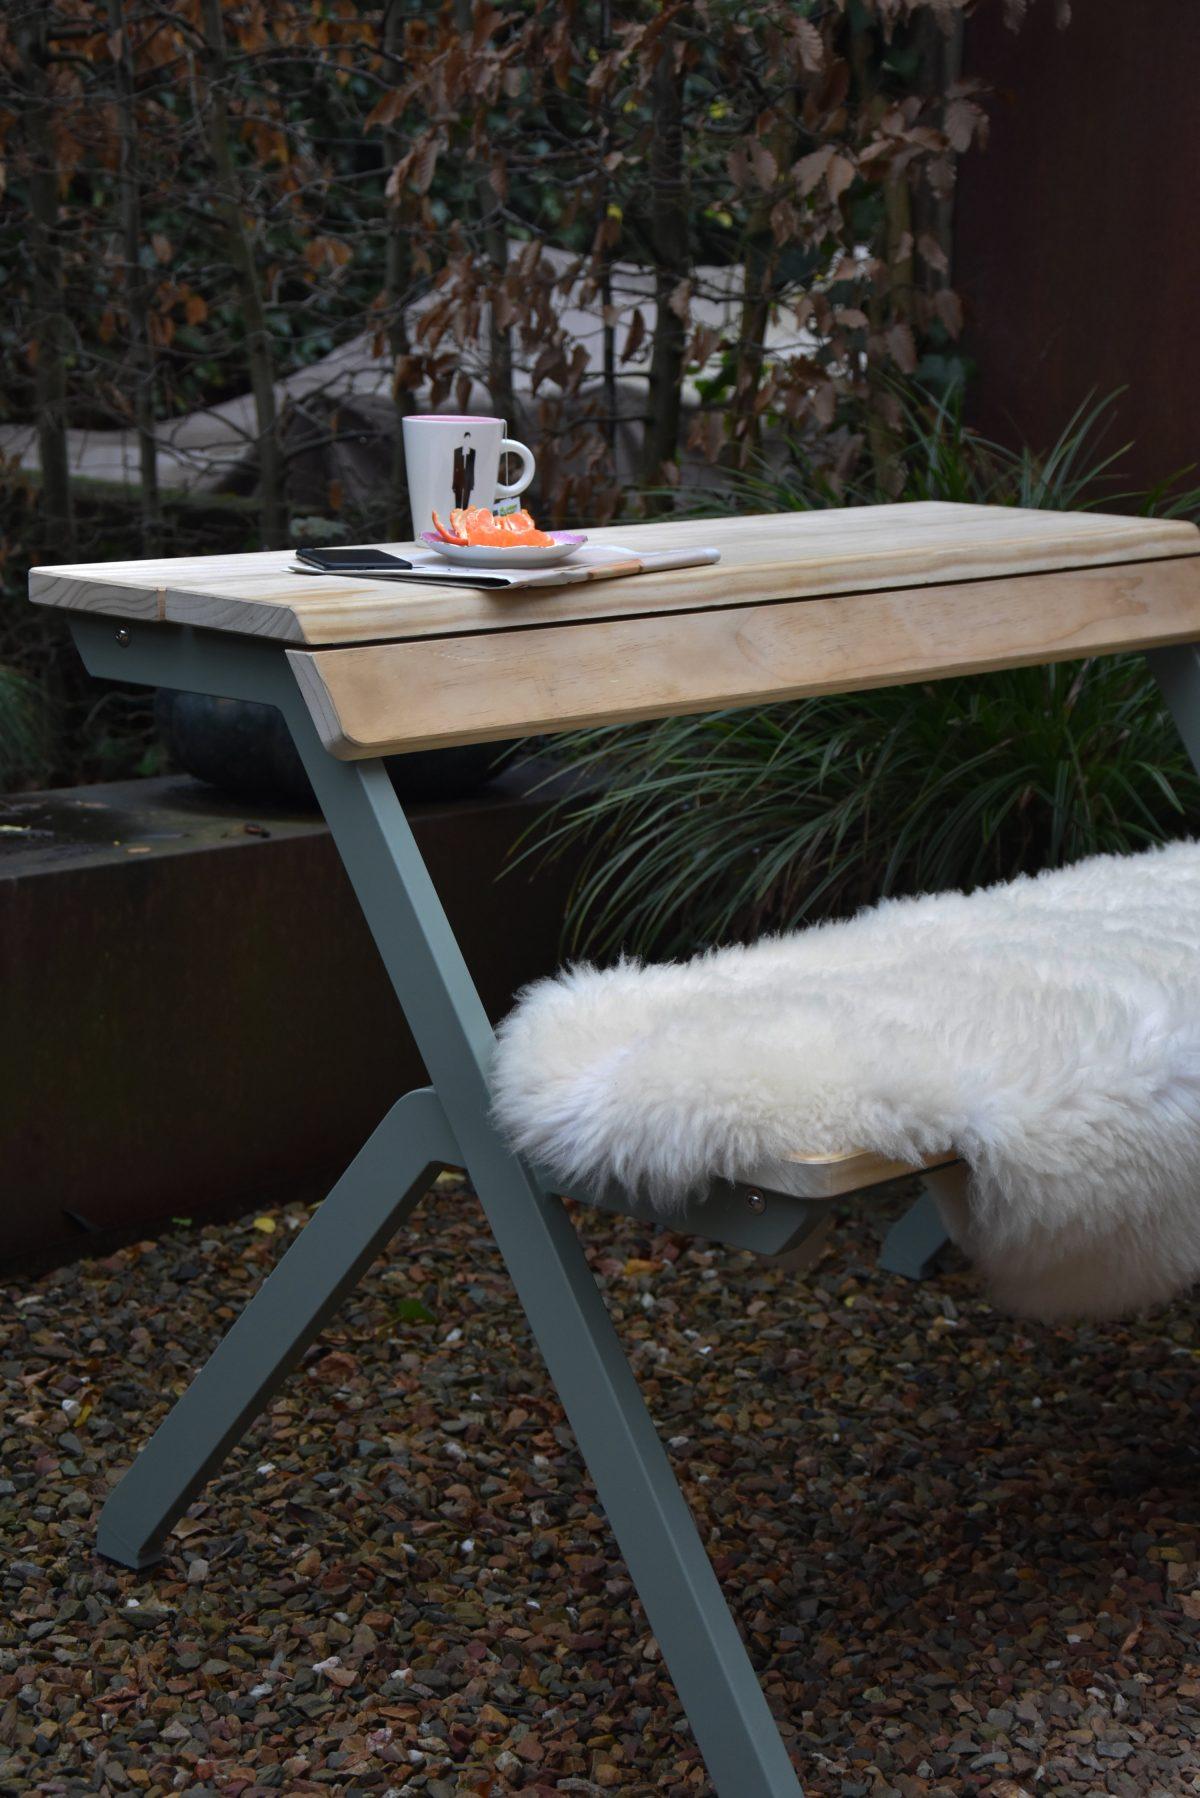 Weltevree Tablebench Outdoor Furniture Dutch Design